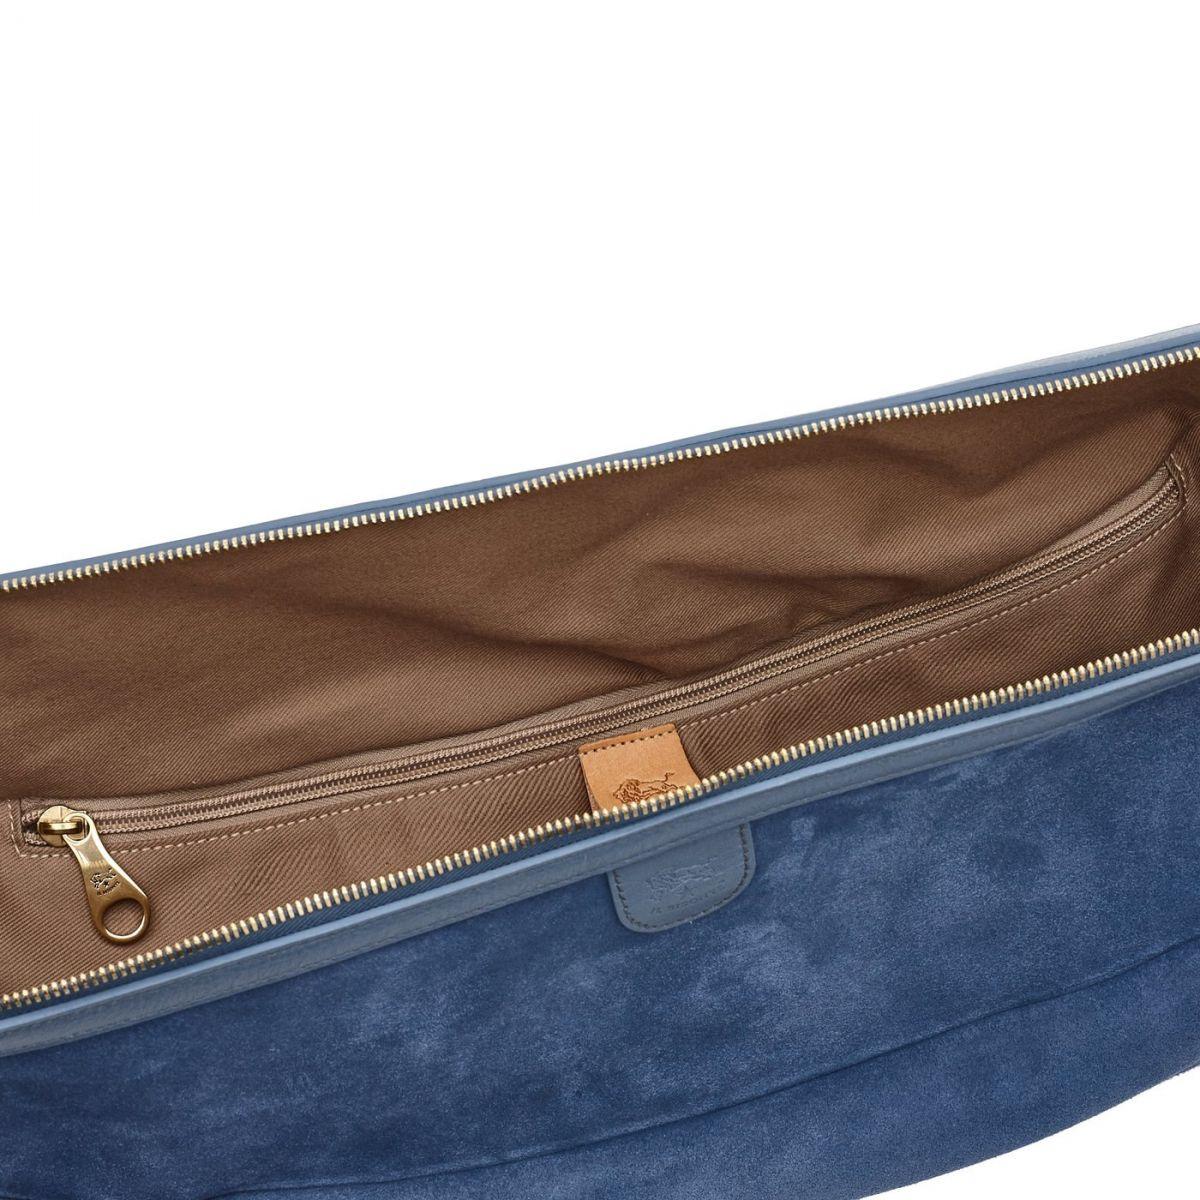 Women's Crossbody Bag  in Suede BCR153 color Sugar | Details